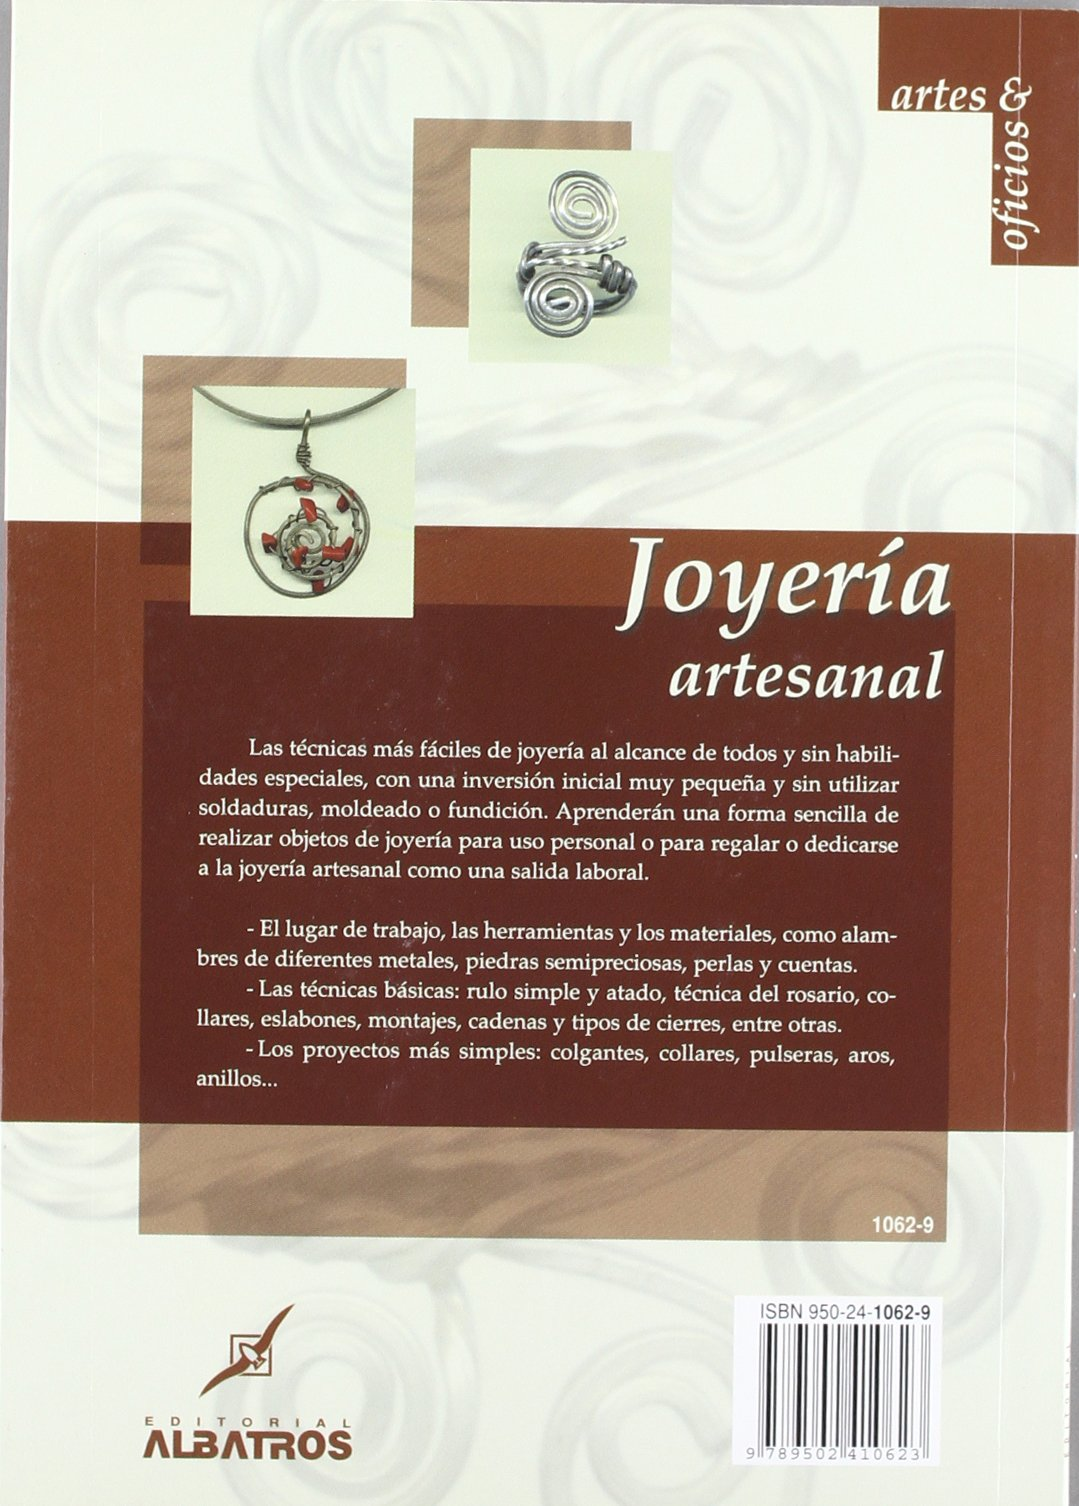 Joyeria Artesanal (Artes & Oficios) (Spanish Edition): Tomas OFarrell: 9789502410623: Amazon.com: Books